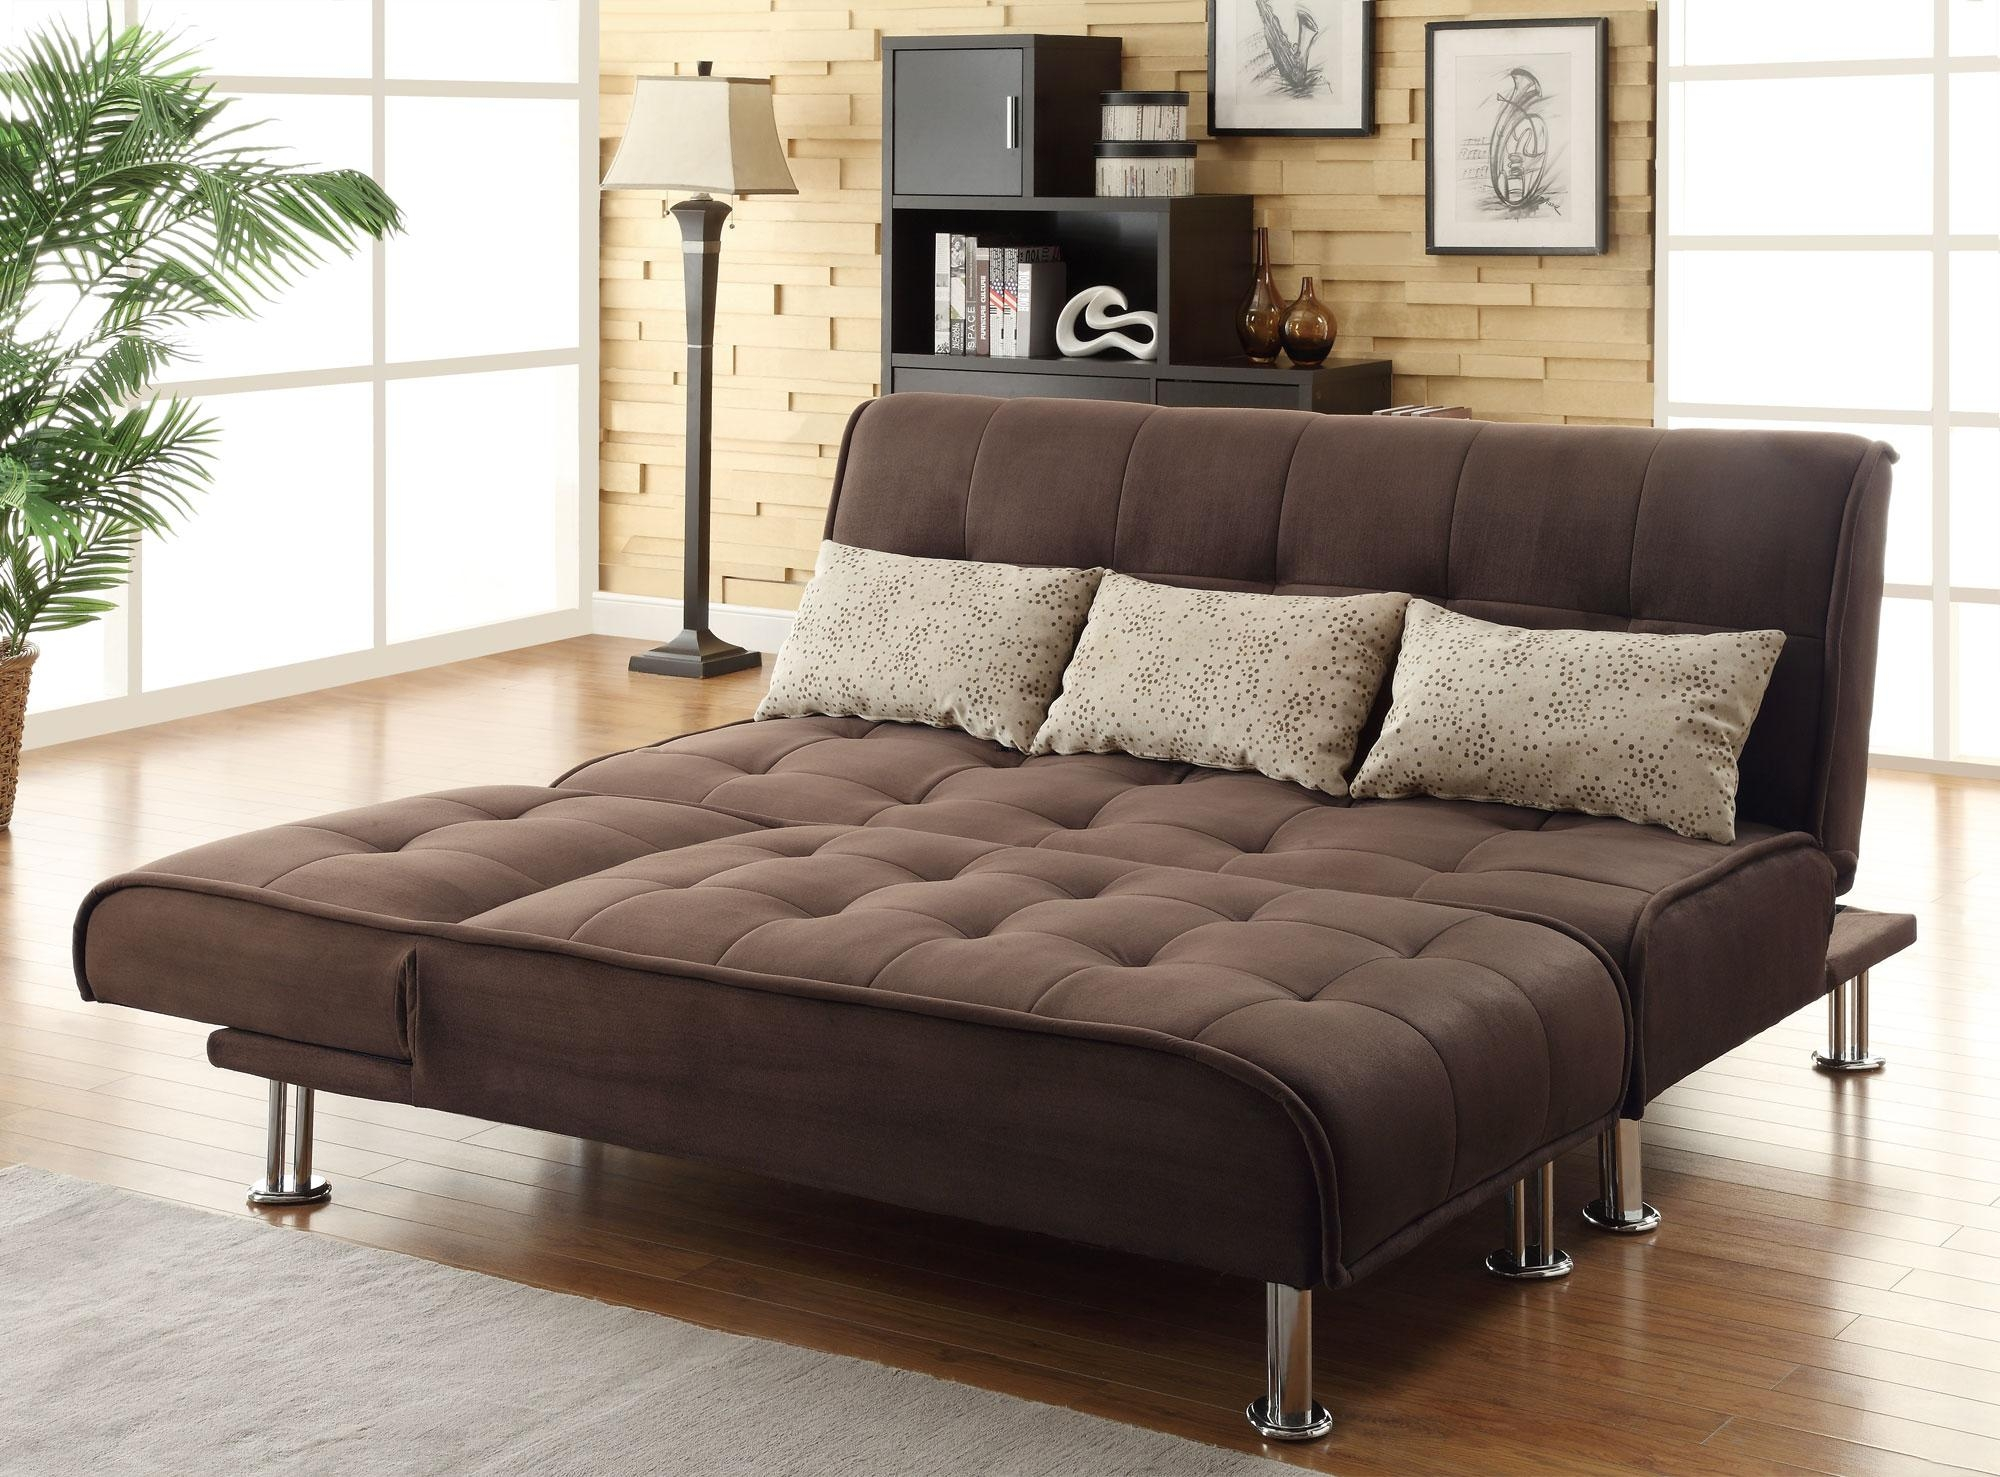 Furniture: Target Futons | Futon Beds Walmart | Couch Bed Walmart For Futon Couch Beds (View 11 of 20)